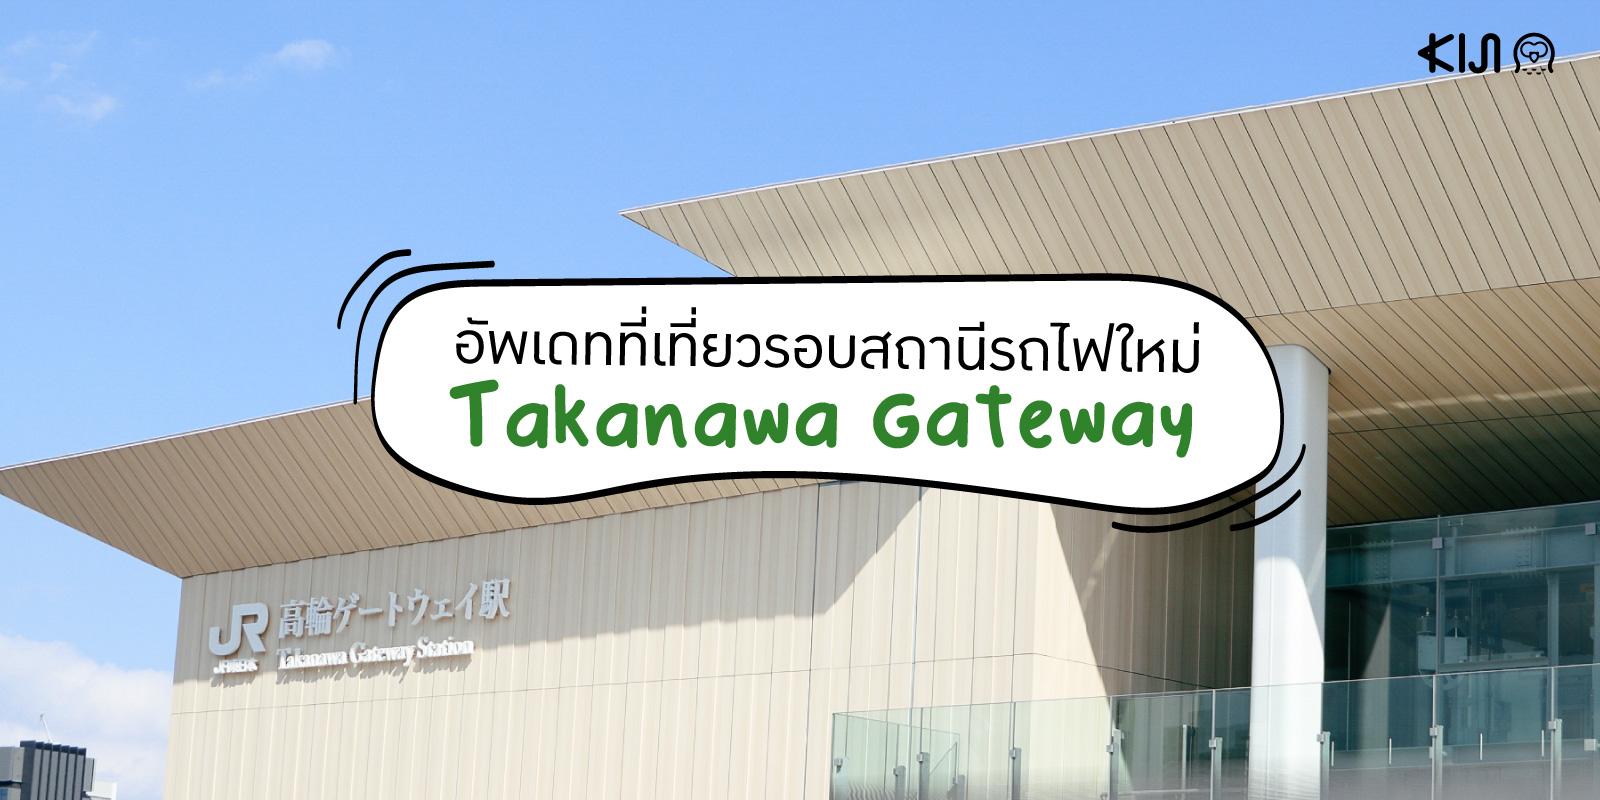 Takanawa Gateway ณ กรุงโตเกียว